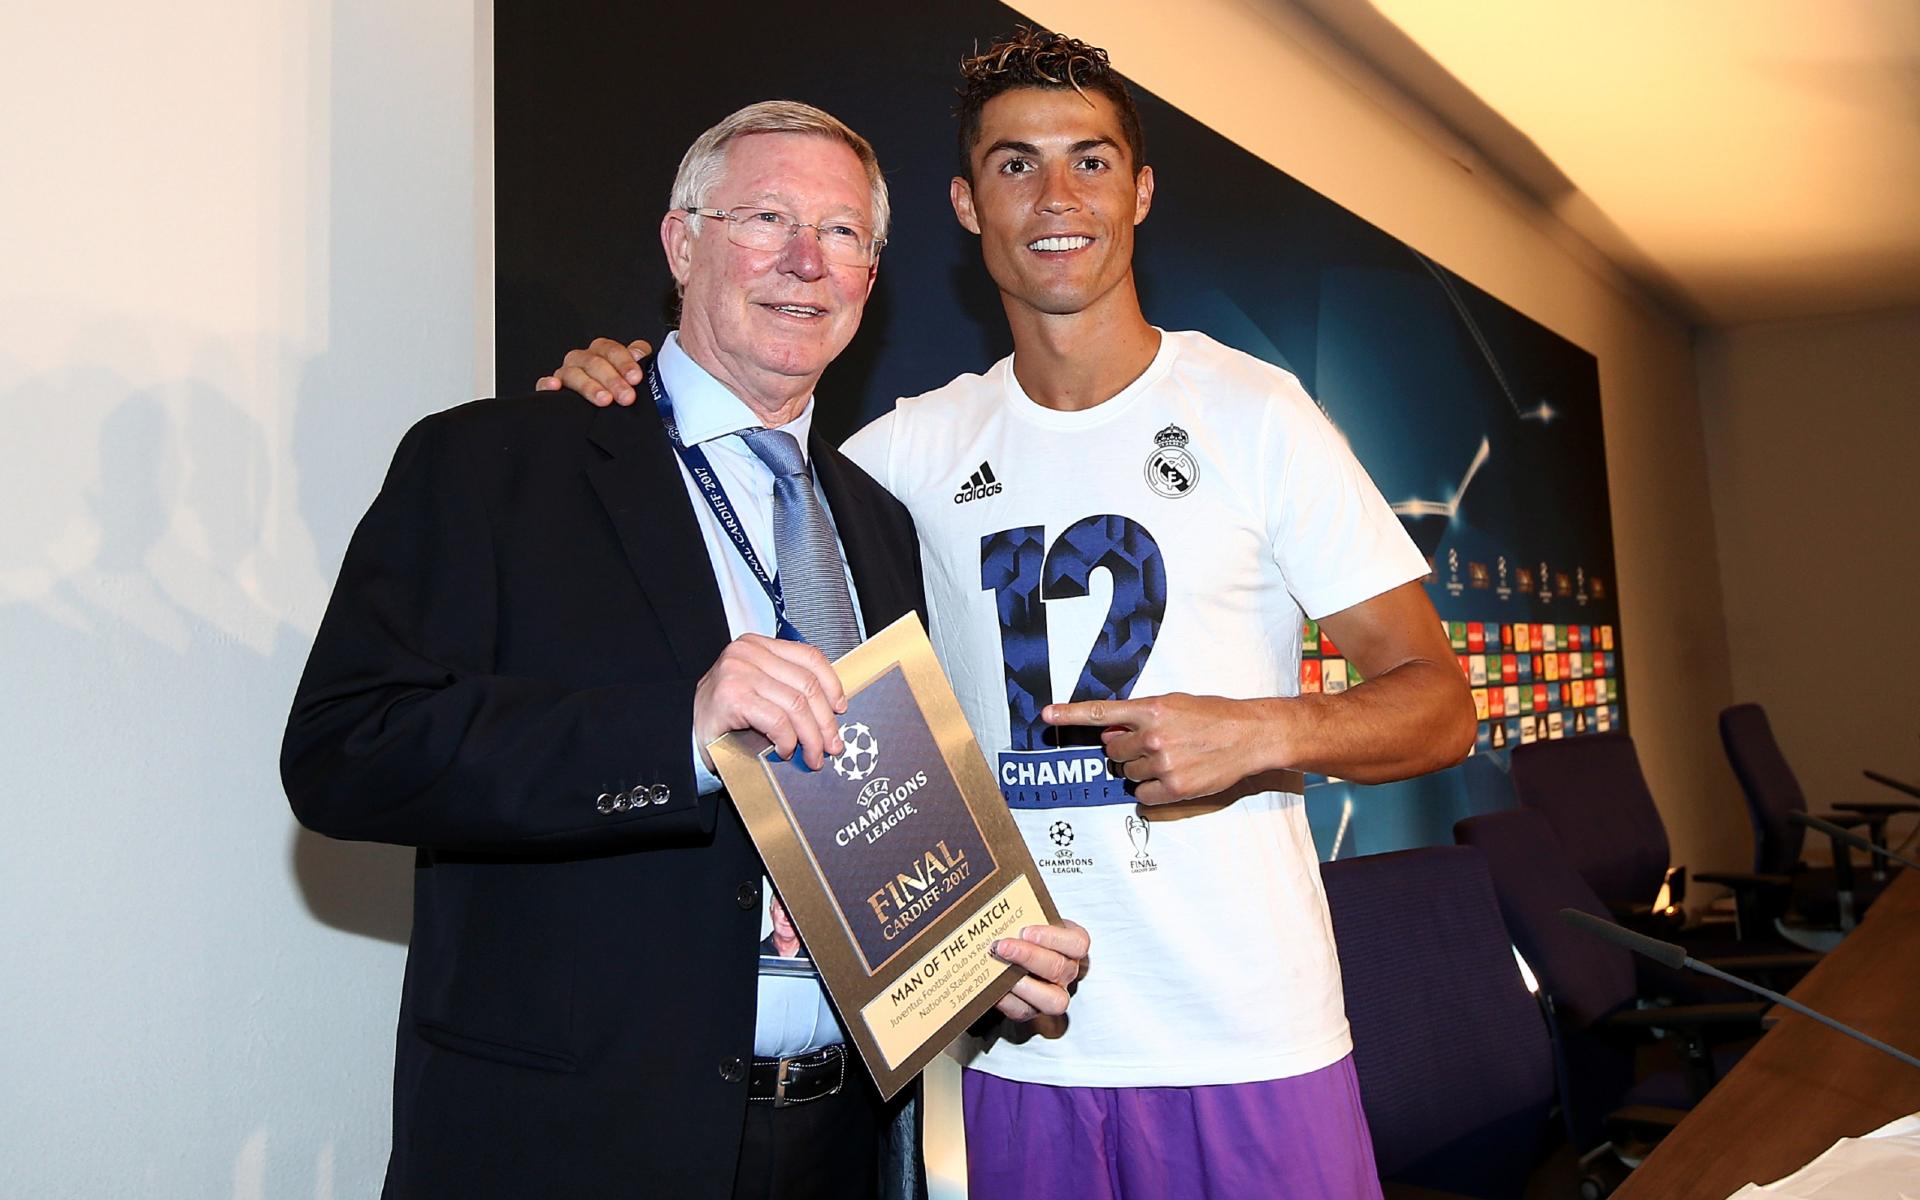 Фото:Handout/UEFA via Getty Images